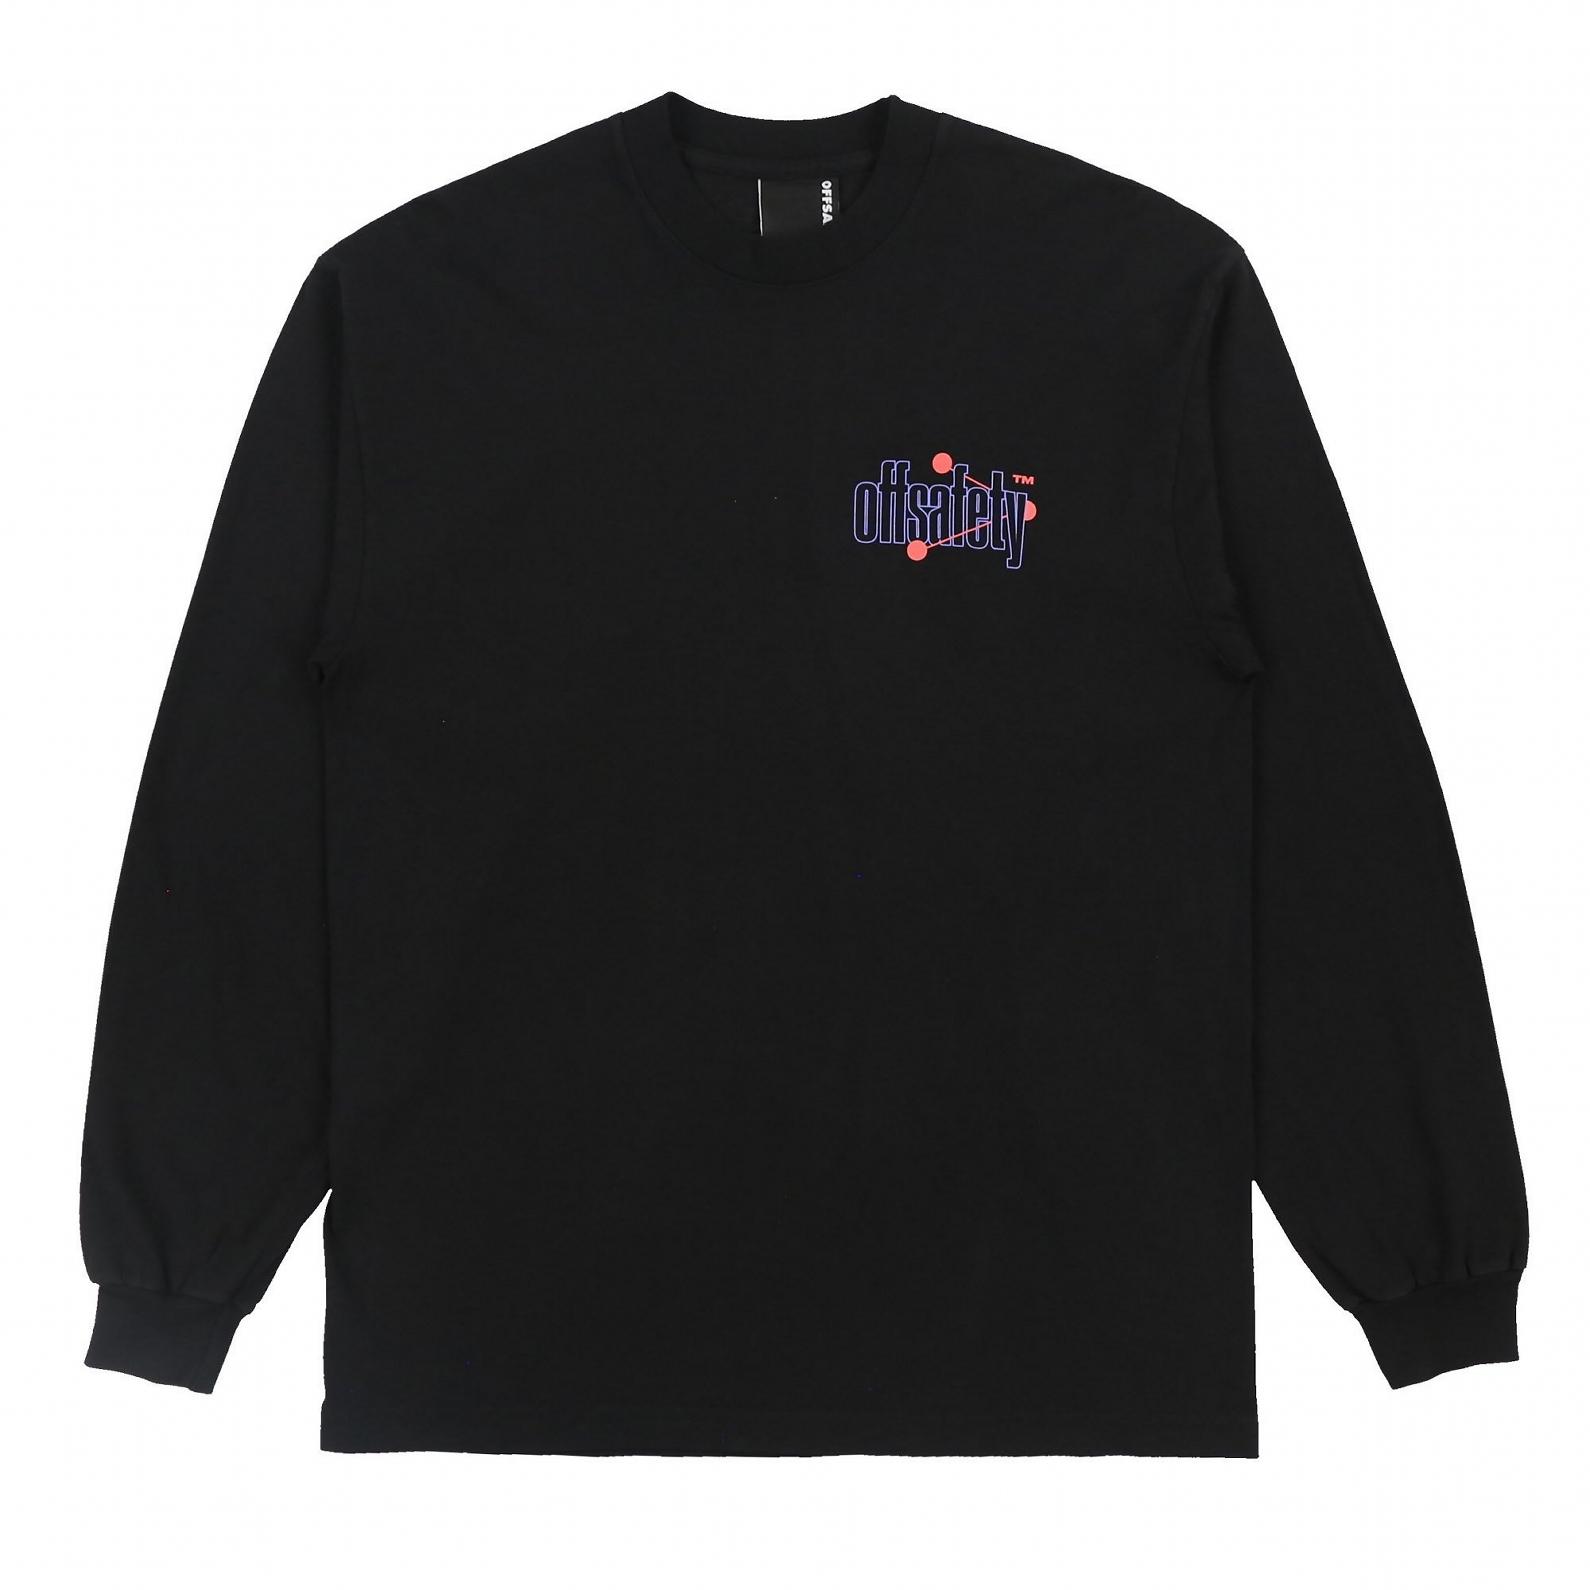 【OFF SAFETY/オフセーフティー】PURPLE PILL LS TEE 長袖Tシャツ / BLACK